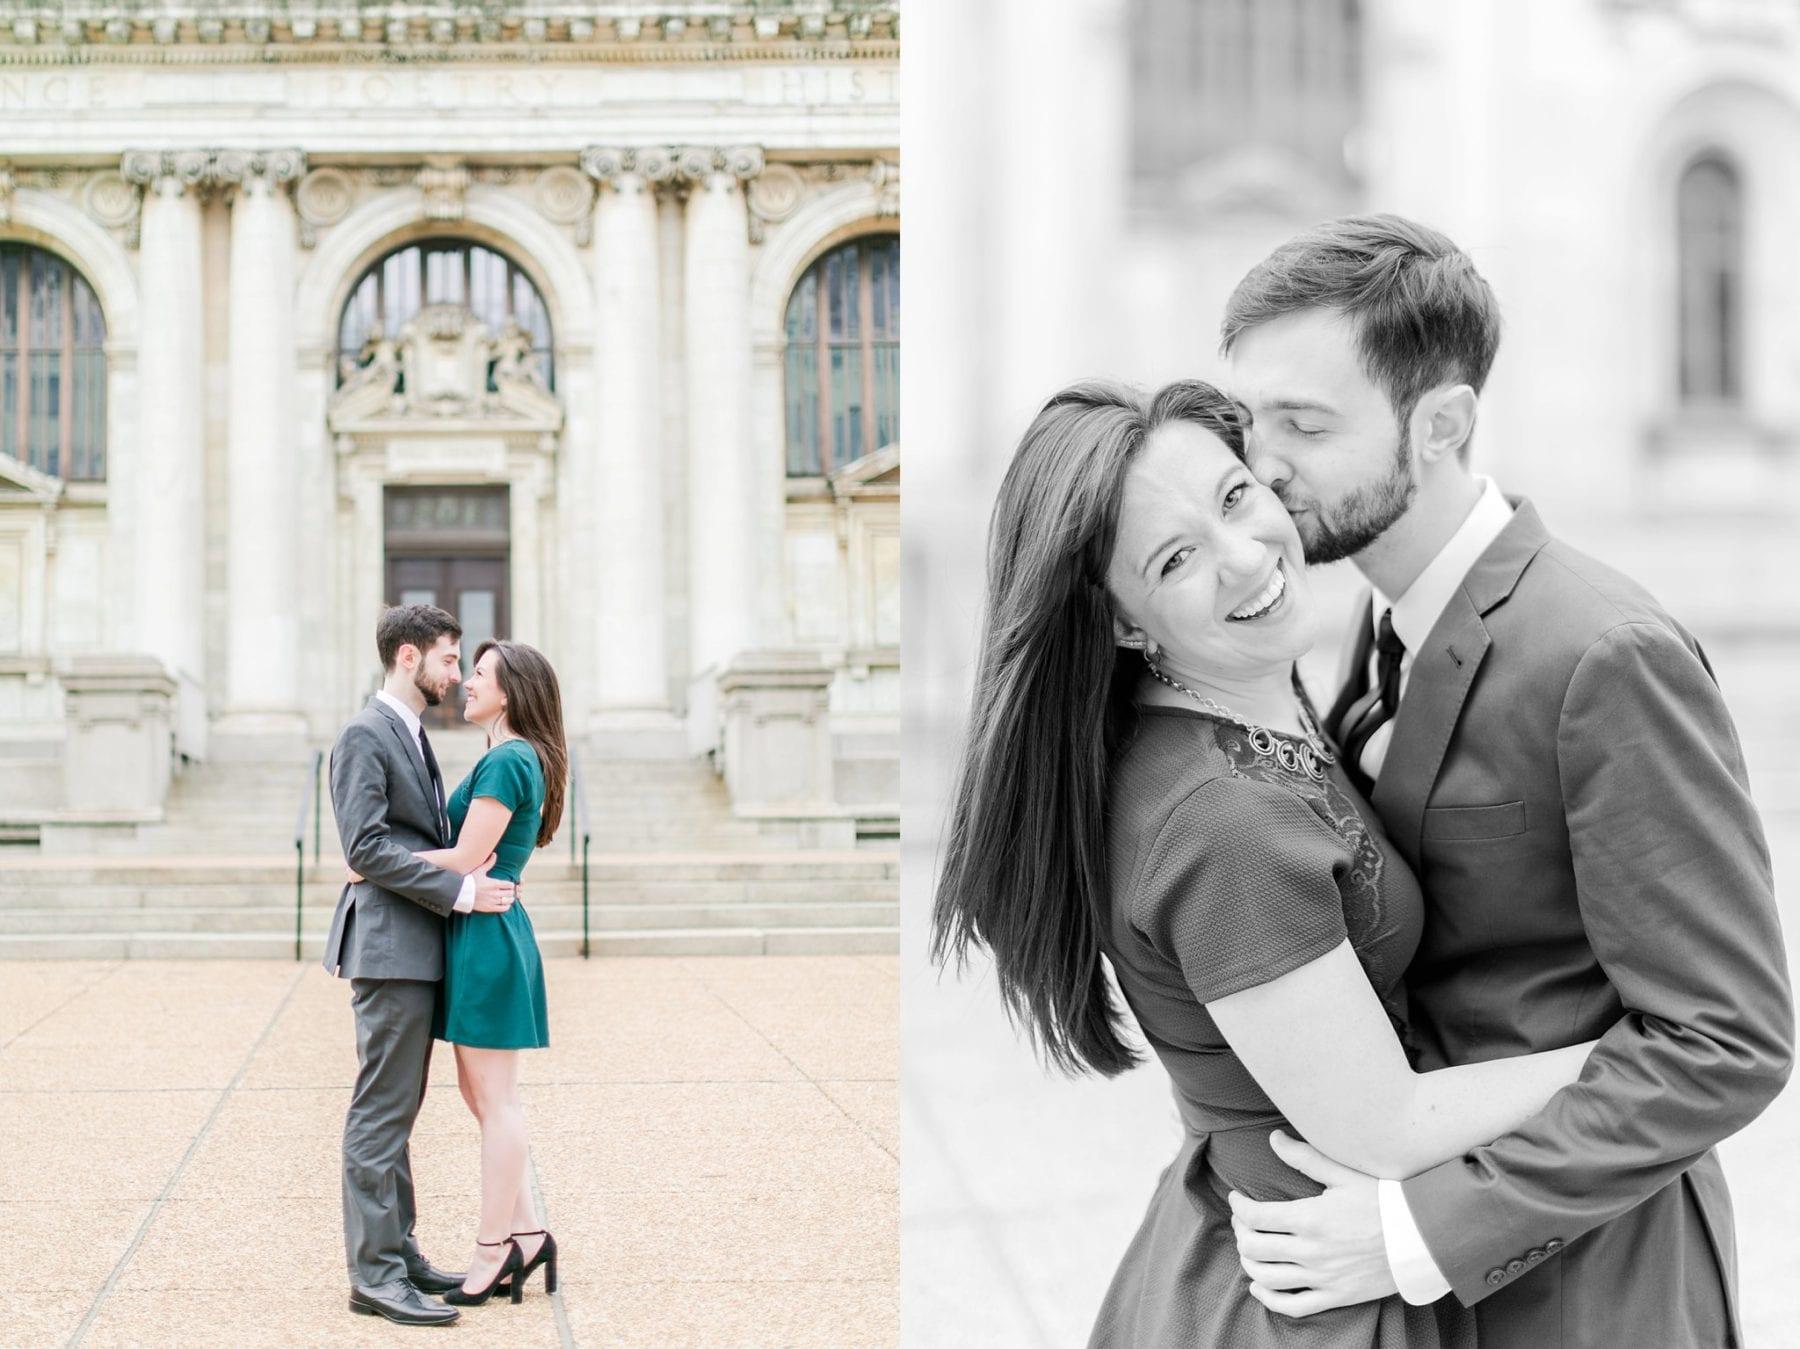 Downtown Washington DC Engagement Photos Megan Kelsey Photography Virginia Wedding Photographer Erin & Mike-0802.jpg